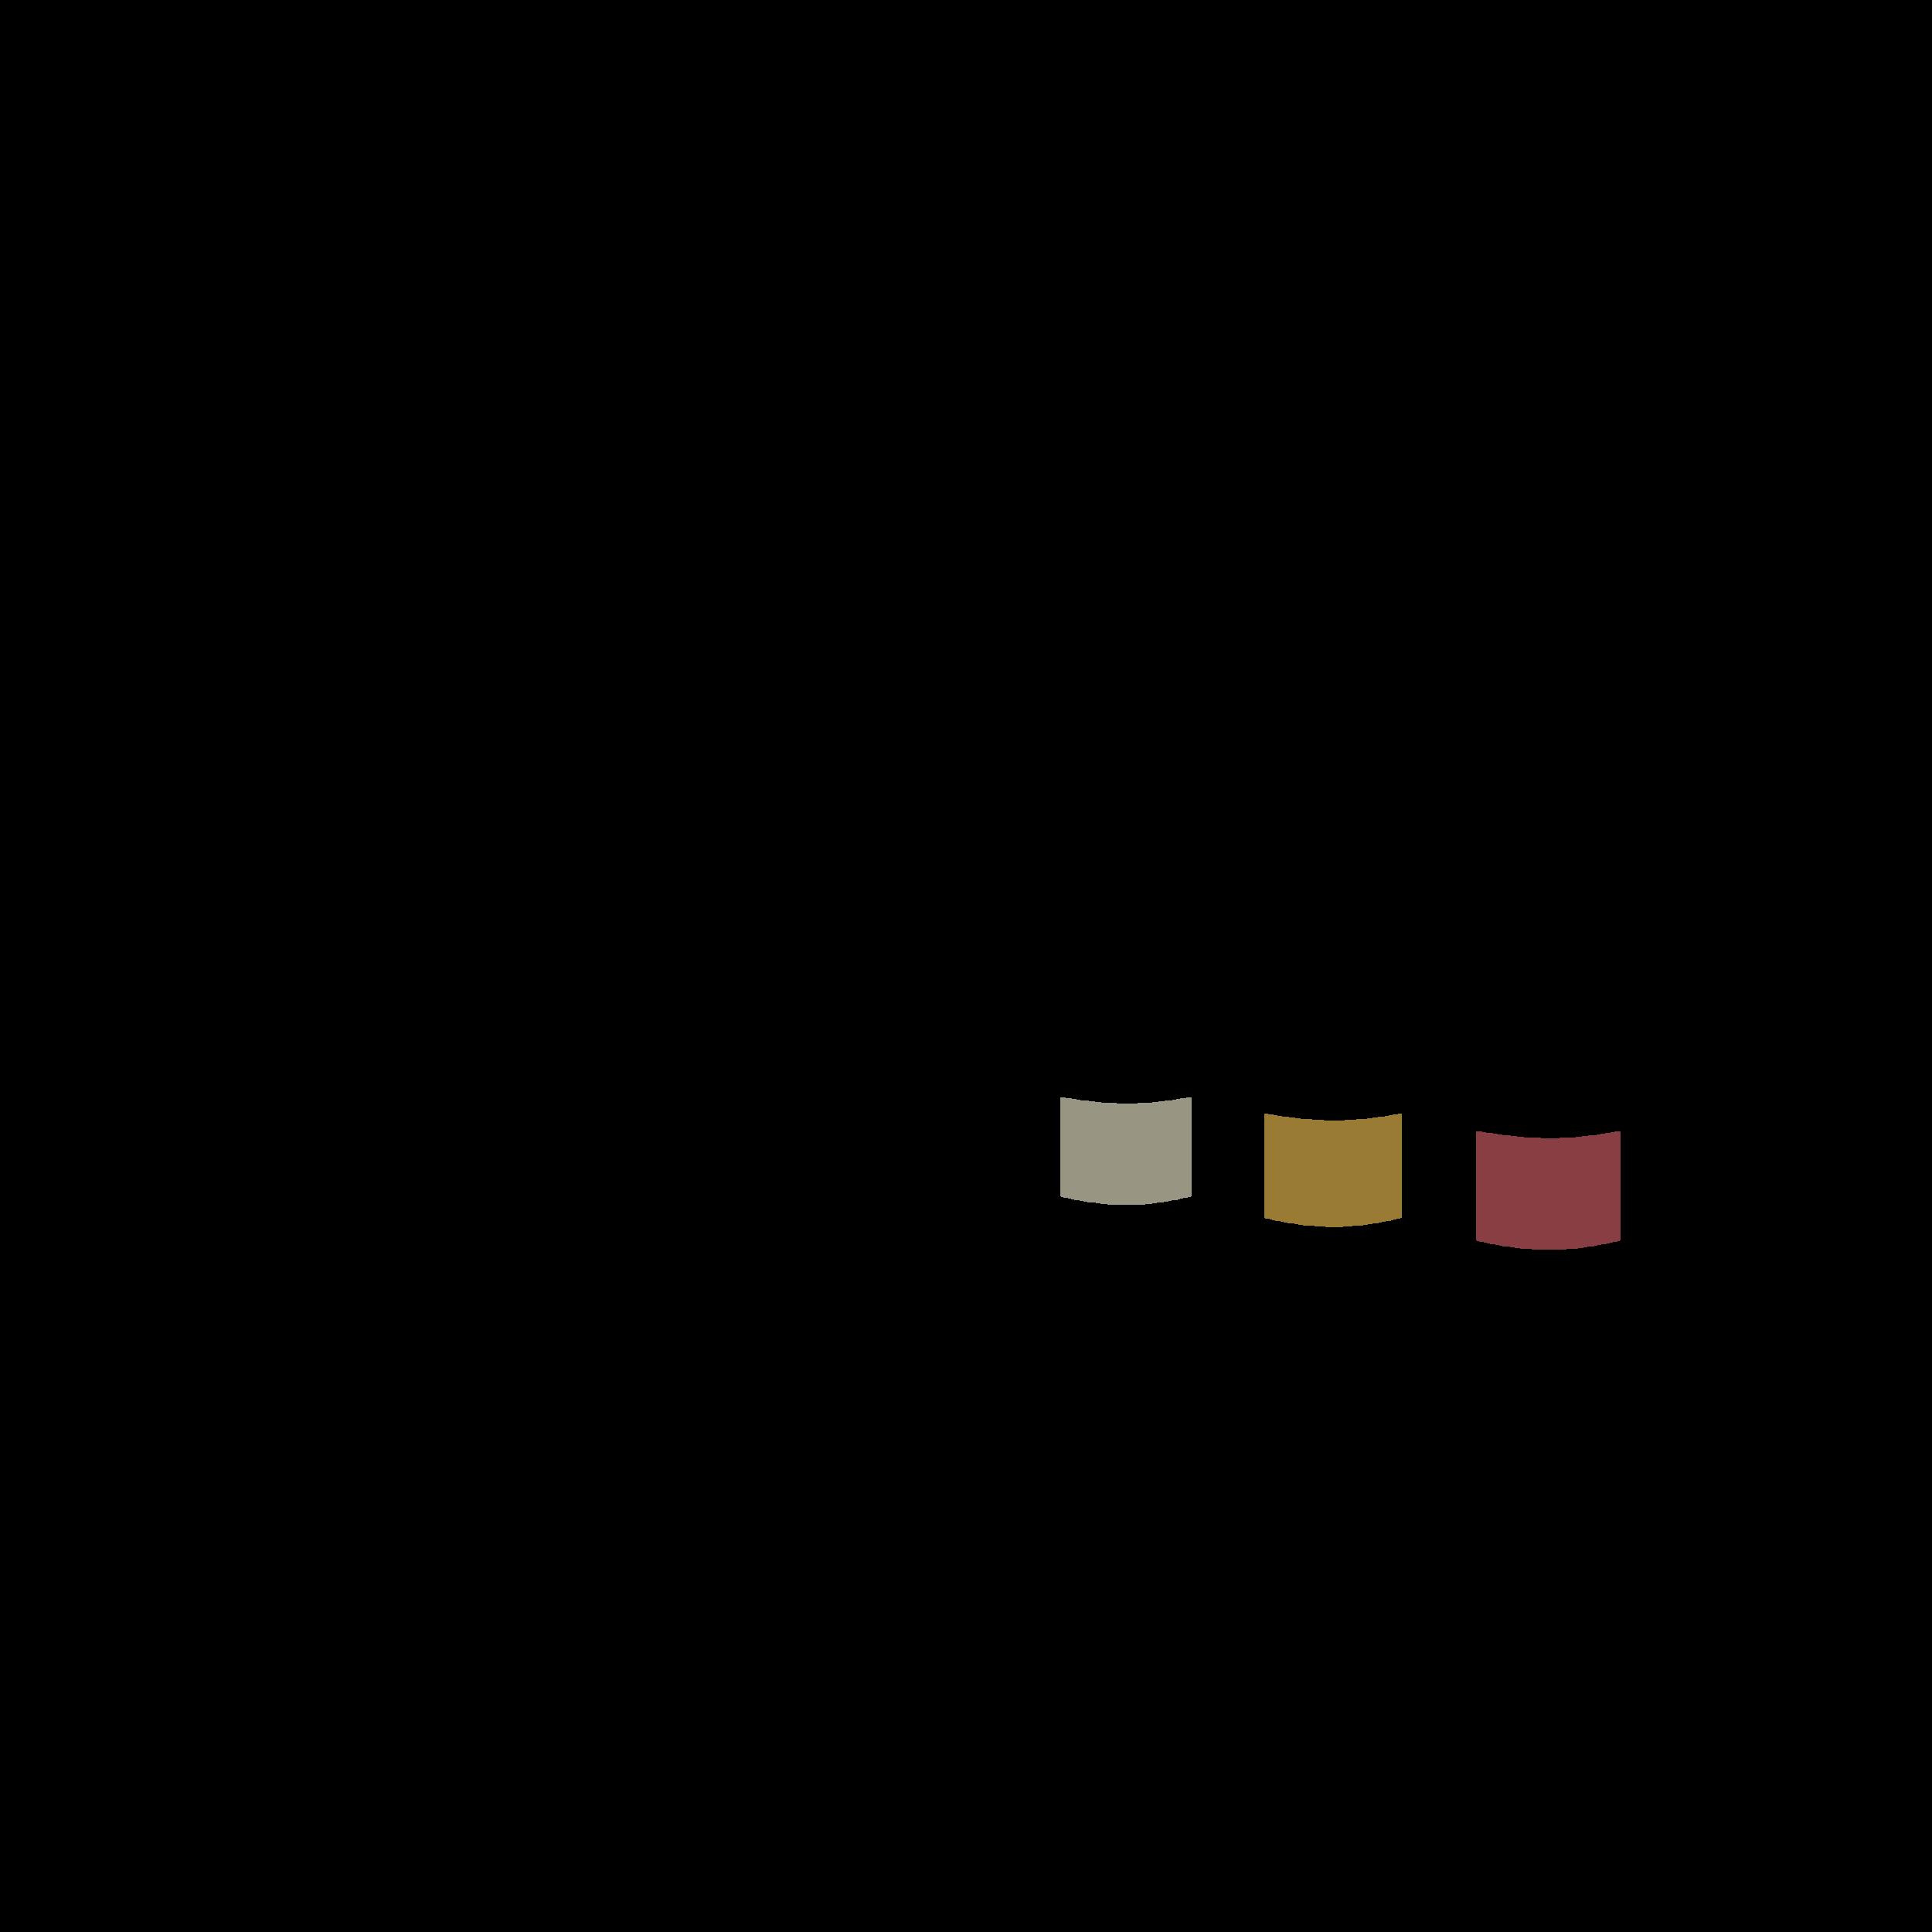 advintage_wine_pusher_color.png